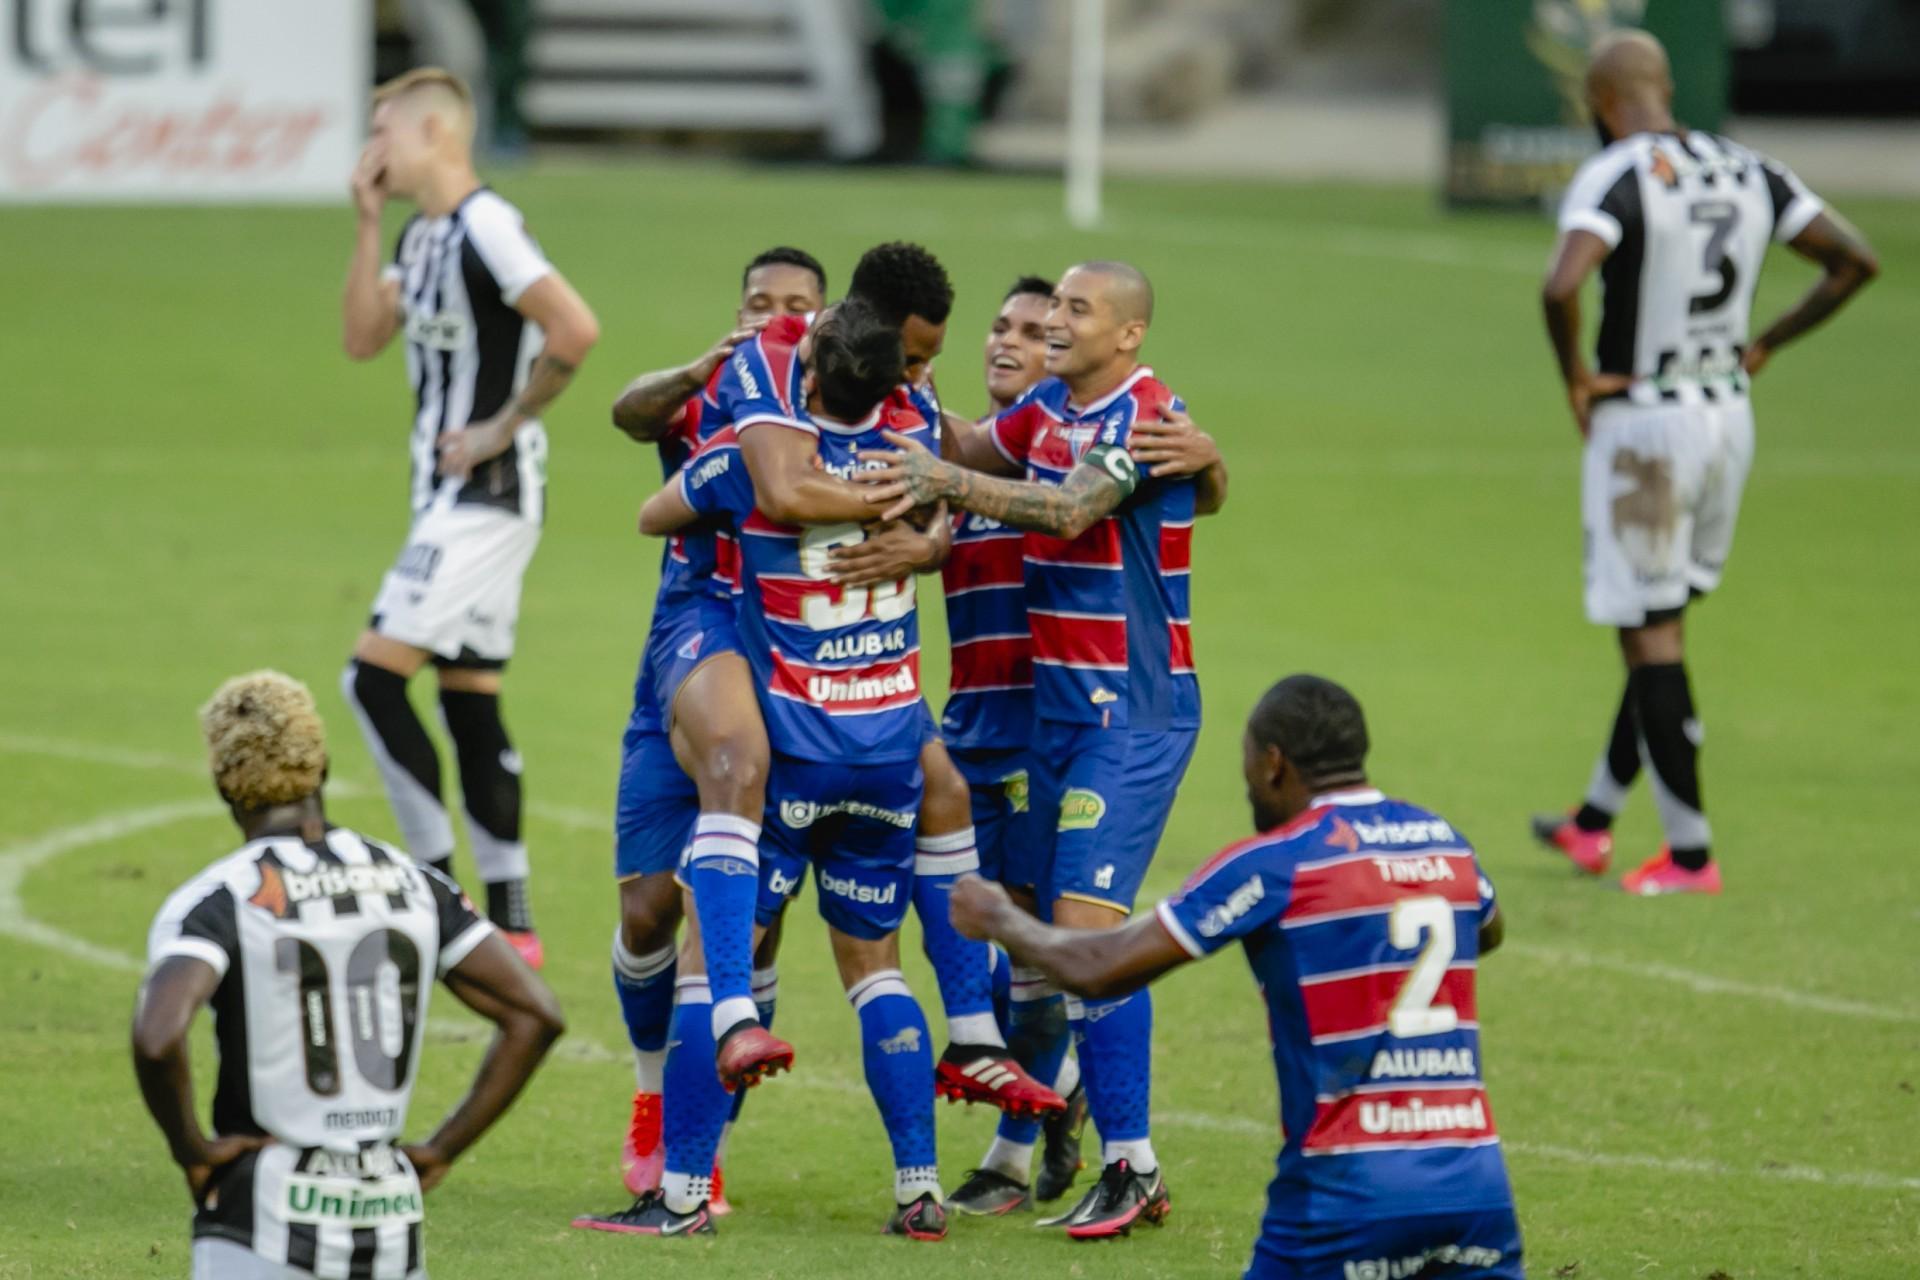 Fortaleza venceu com sobras o rival Ceará no último Clássico-Rei